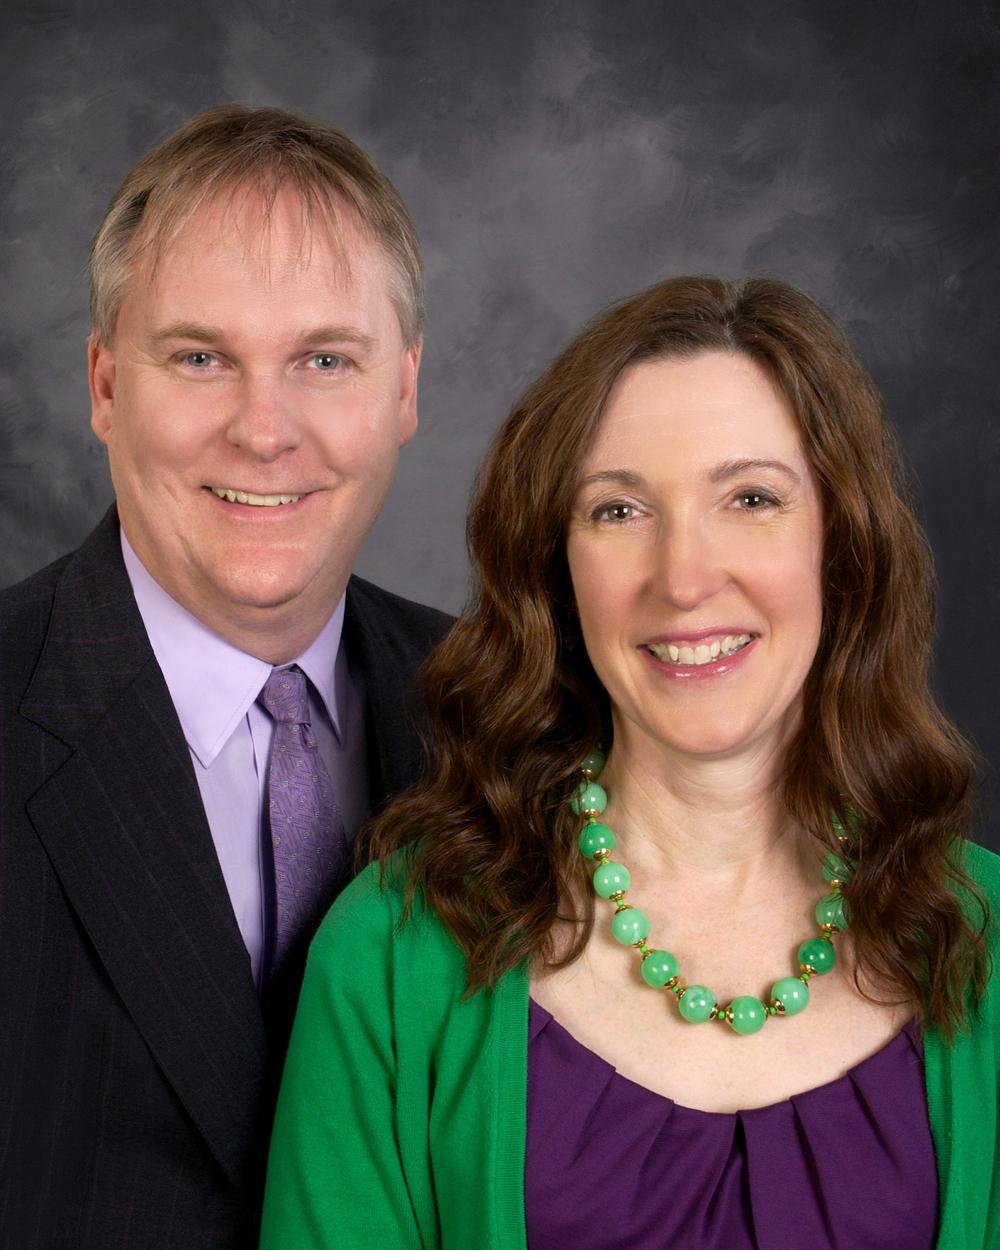 Bill and Kathy Brittain